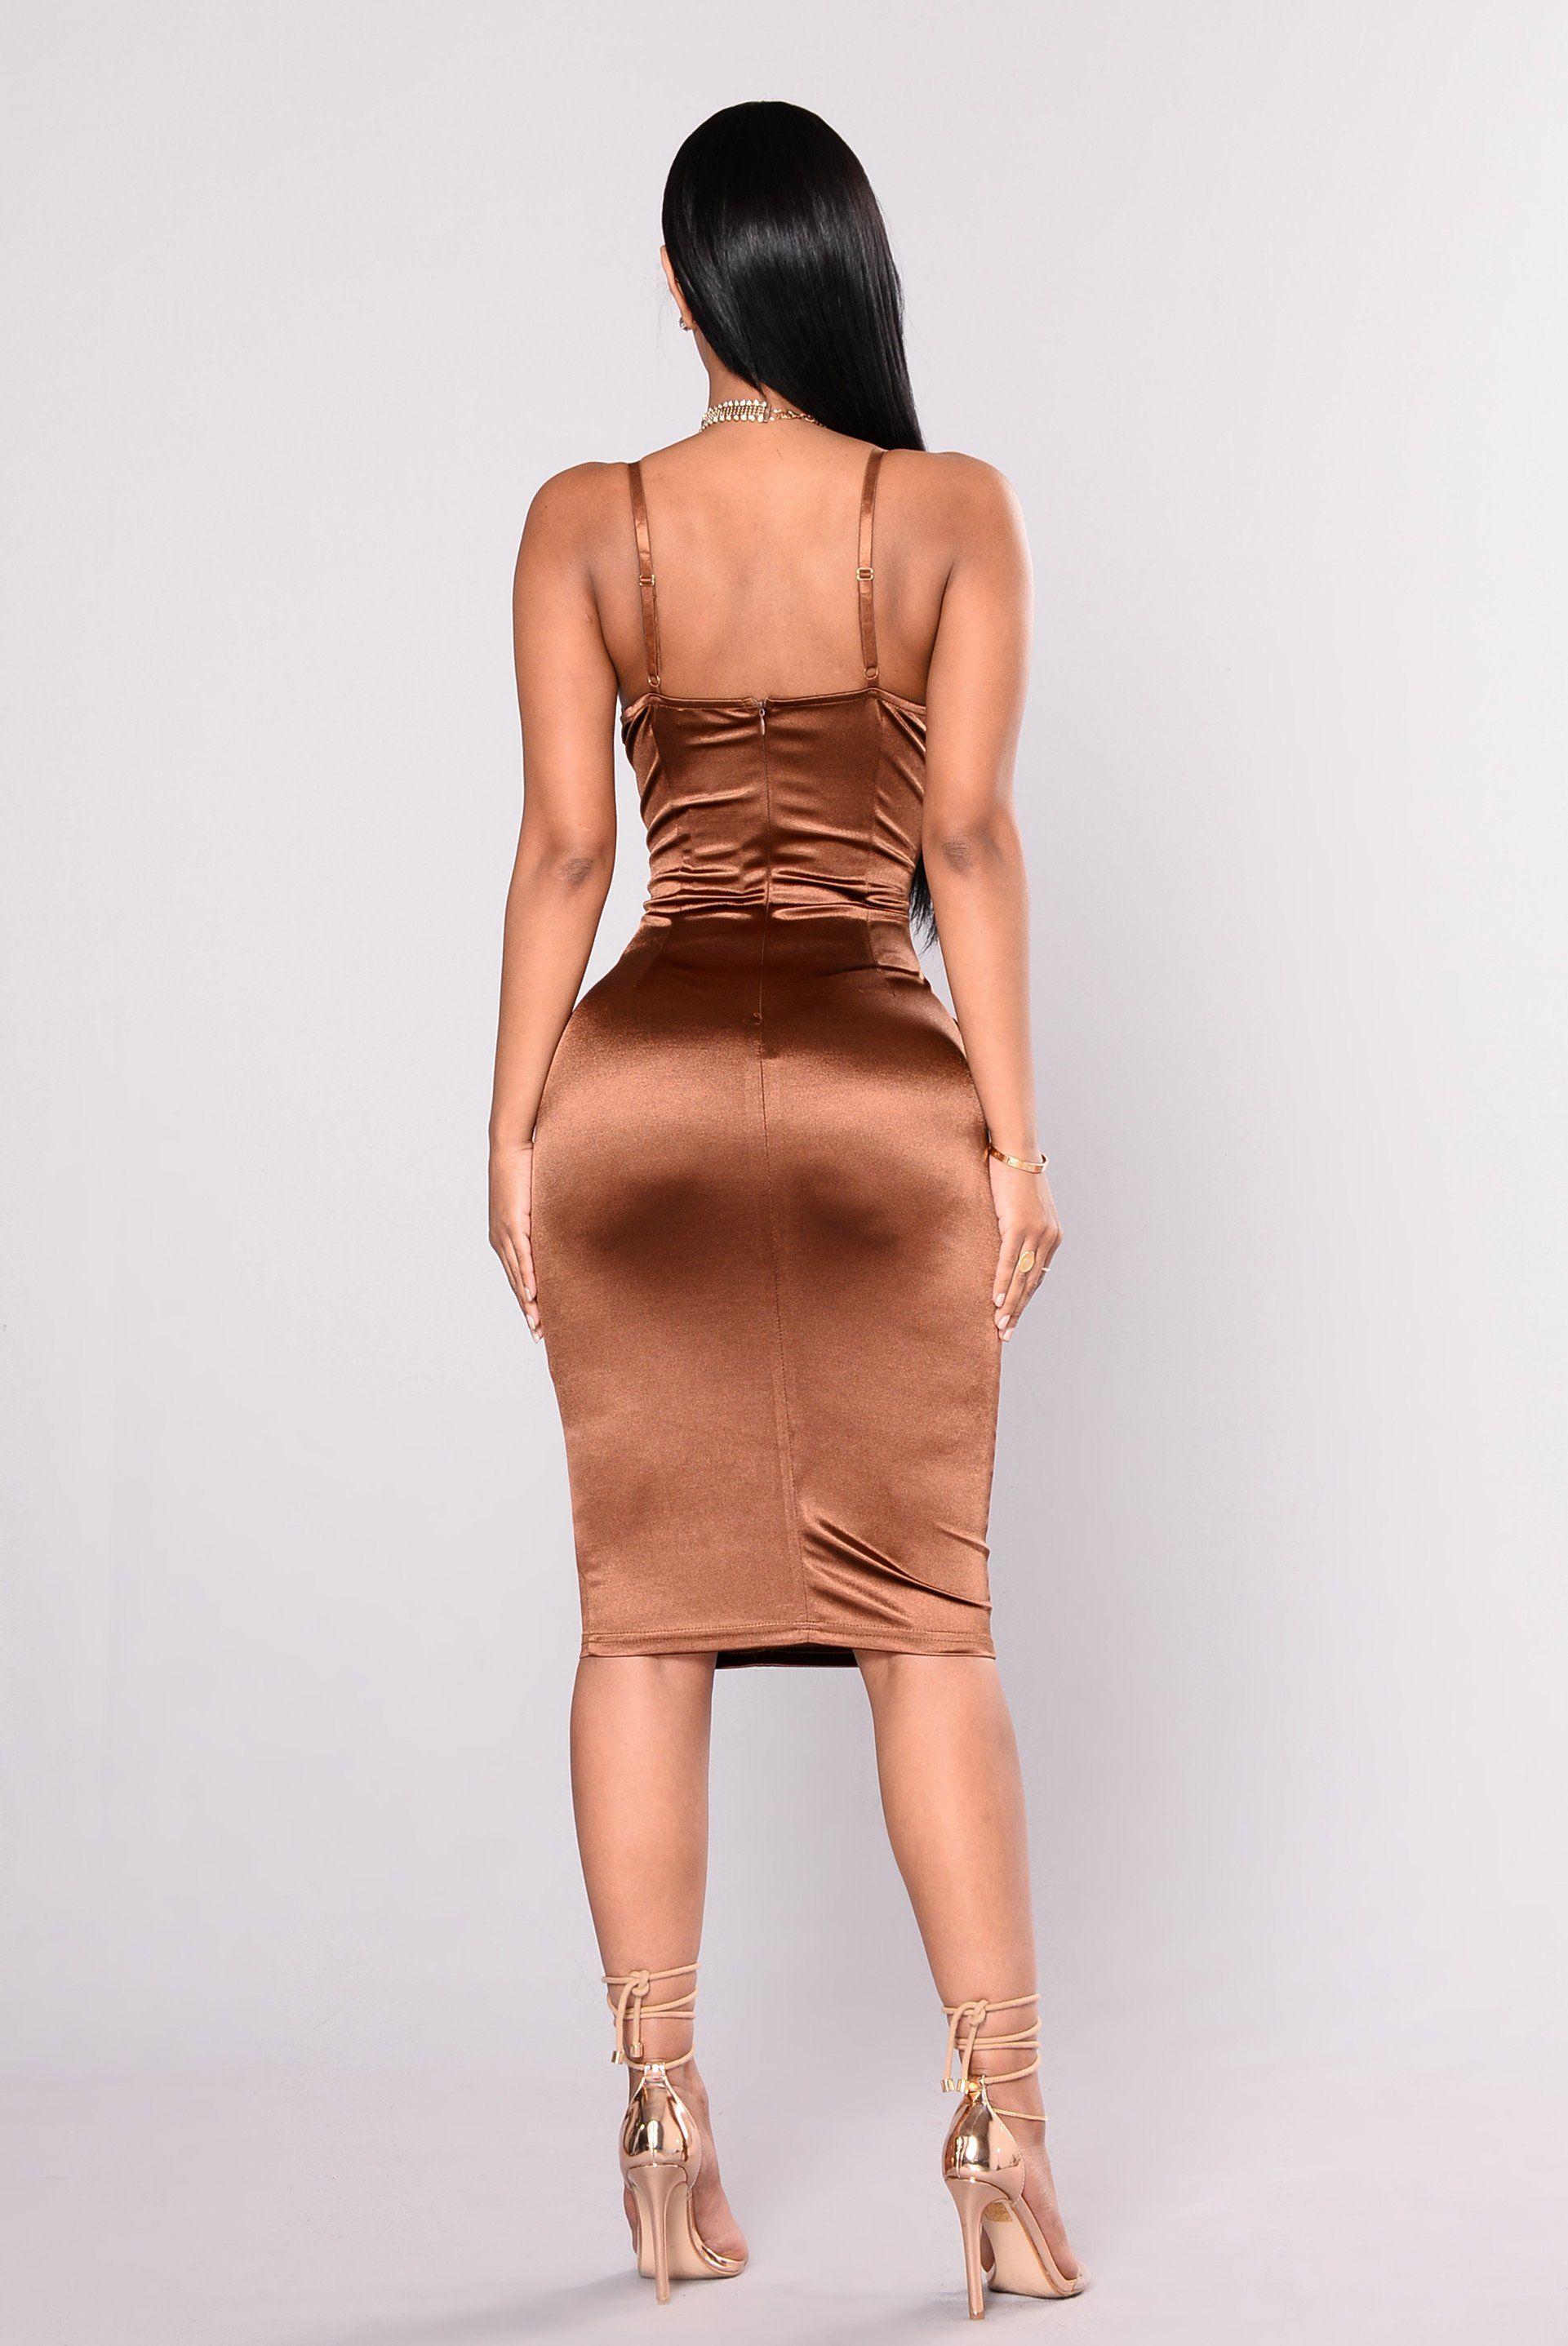 f6ece5711292 Stupid In Love Dress - Chocolate Satin Skirt